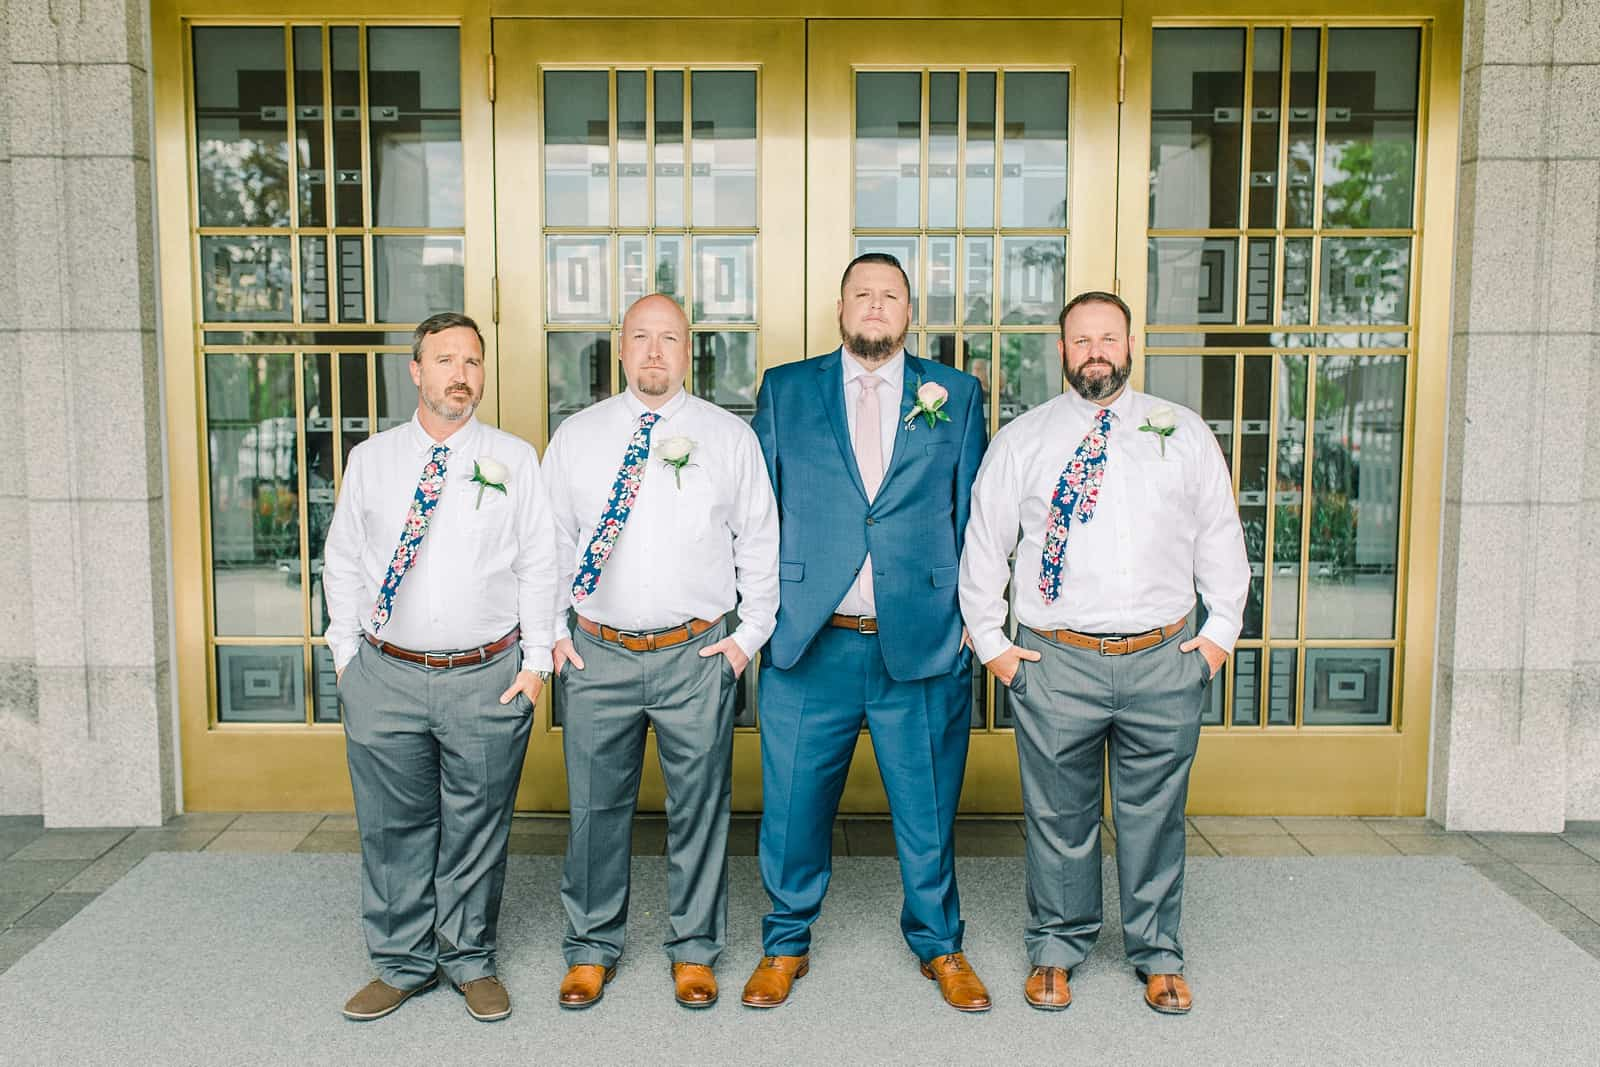 Draper LDS Temple Wedding, Utah wedding photography, summer backyard wedding, groom and groomsmen navy blue suit